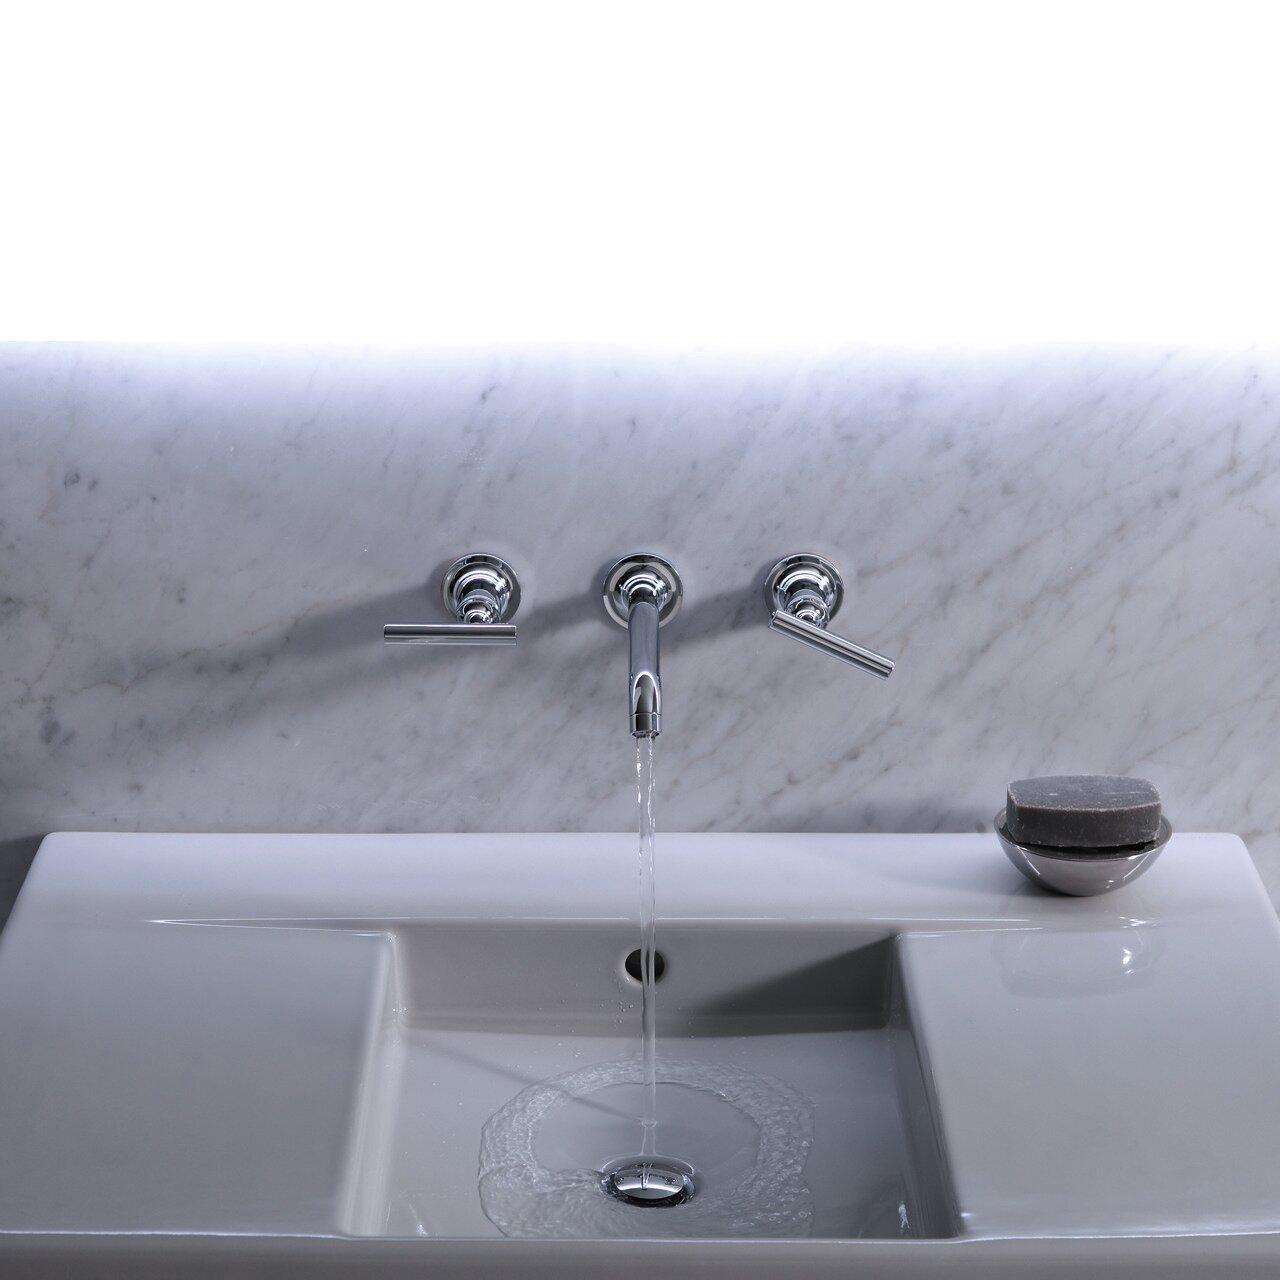 K T14415 4 CP Kohler Purist® Wall mounted Bathroom Faucet